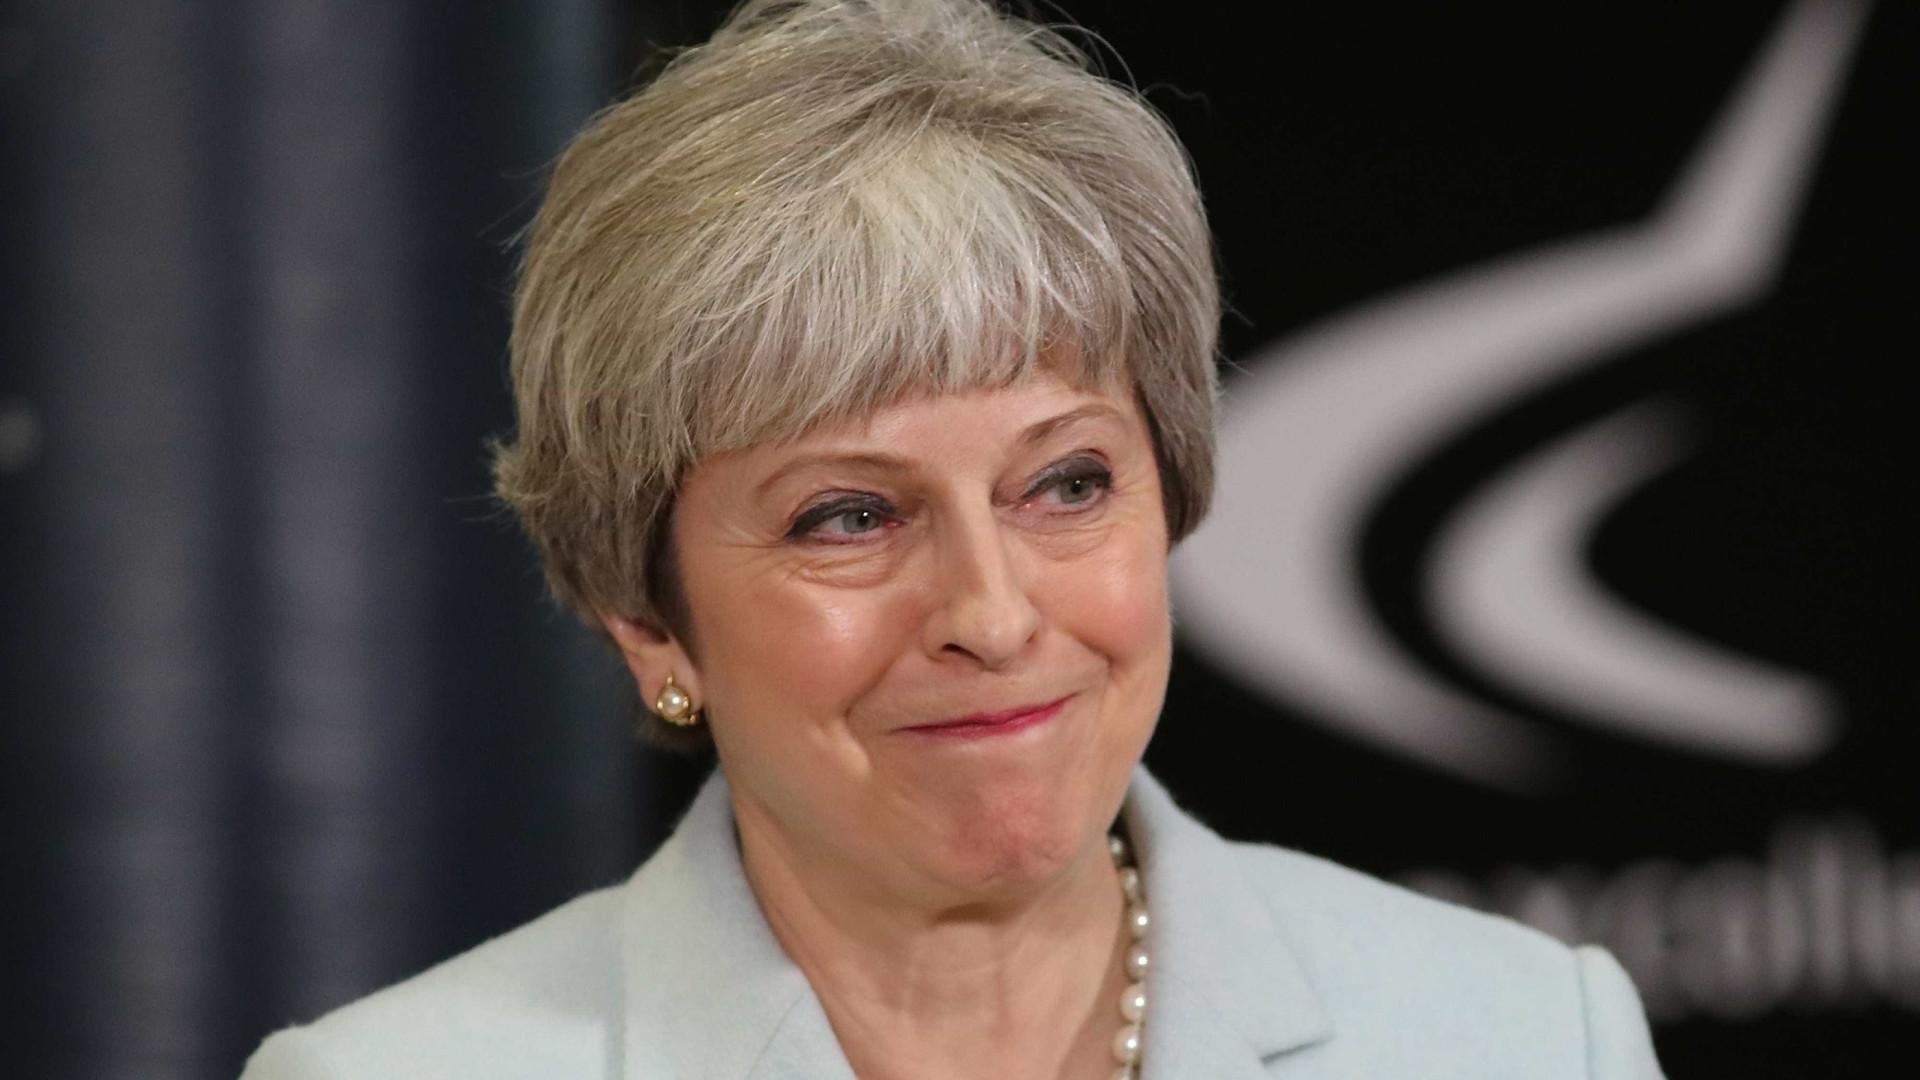 Theresa May interrompeu casal a ter relações sexuais dentro de caravana